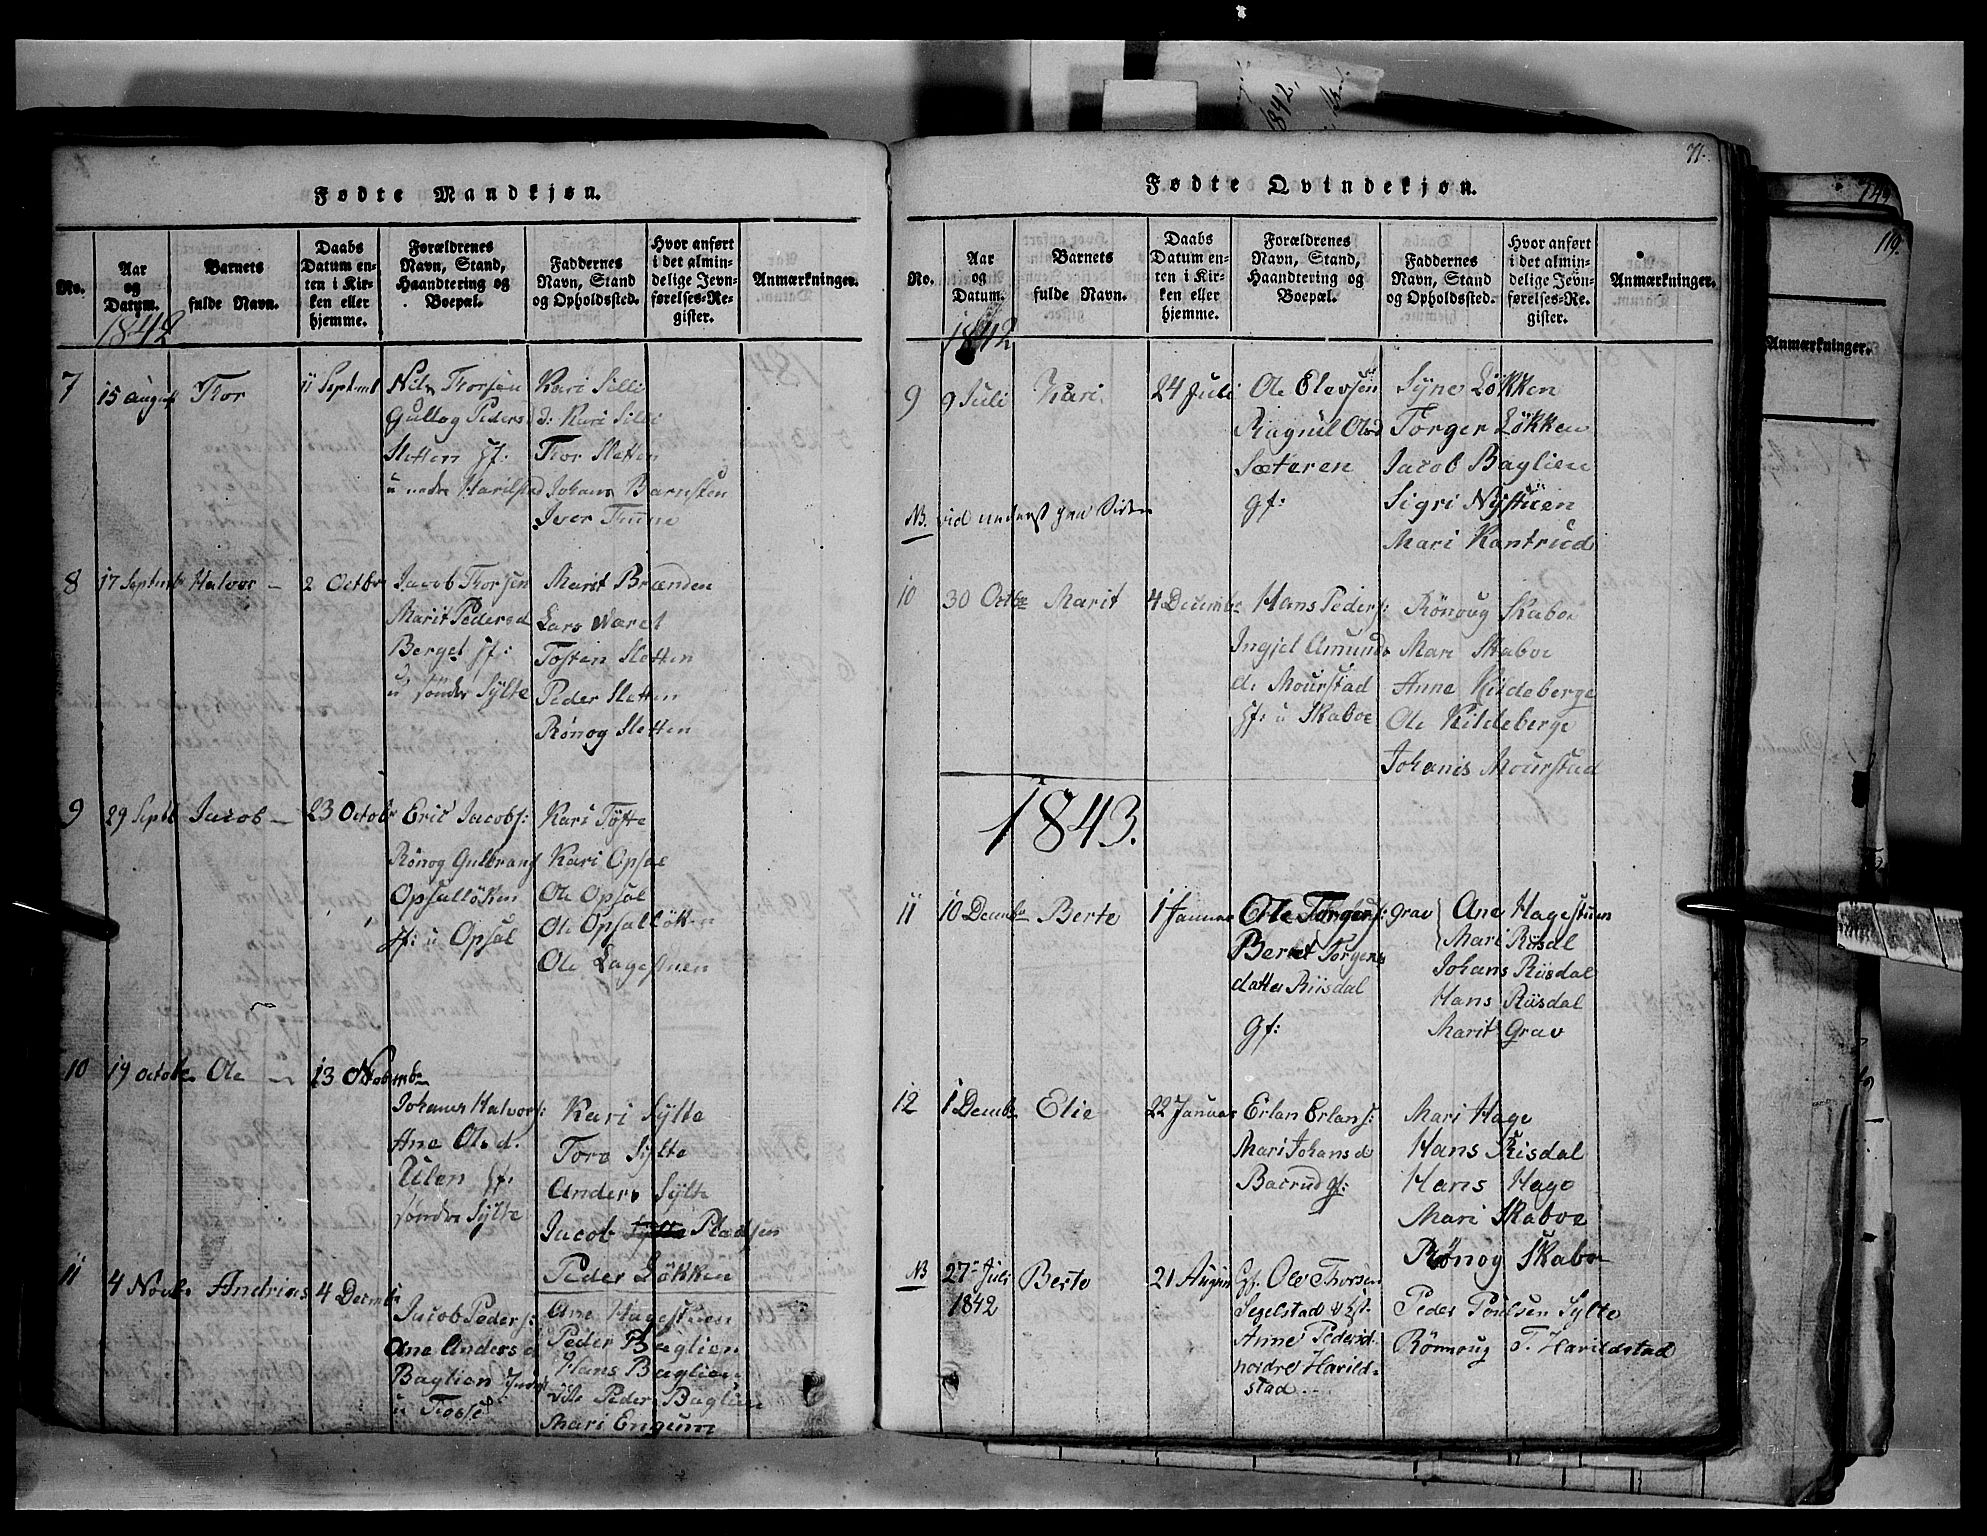 SAH, Fron prestekontor, H/Ha/Hab/L0003: Klokkerbok nr. 3, 1816-1850, s. 71